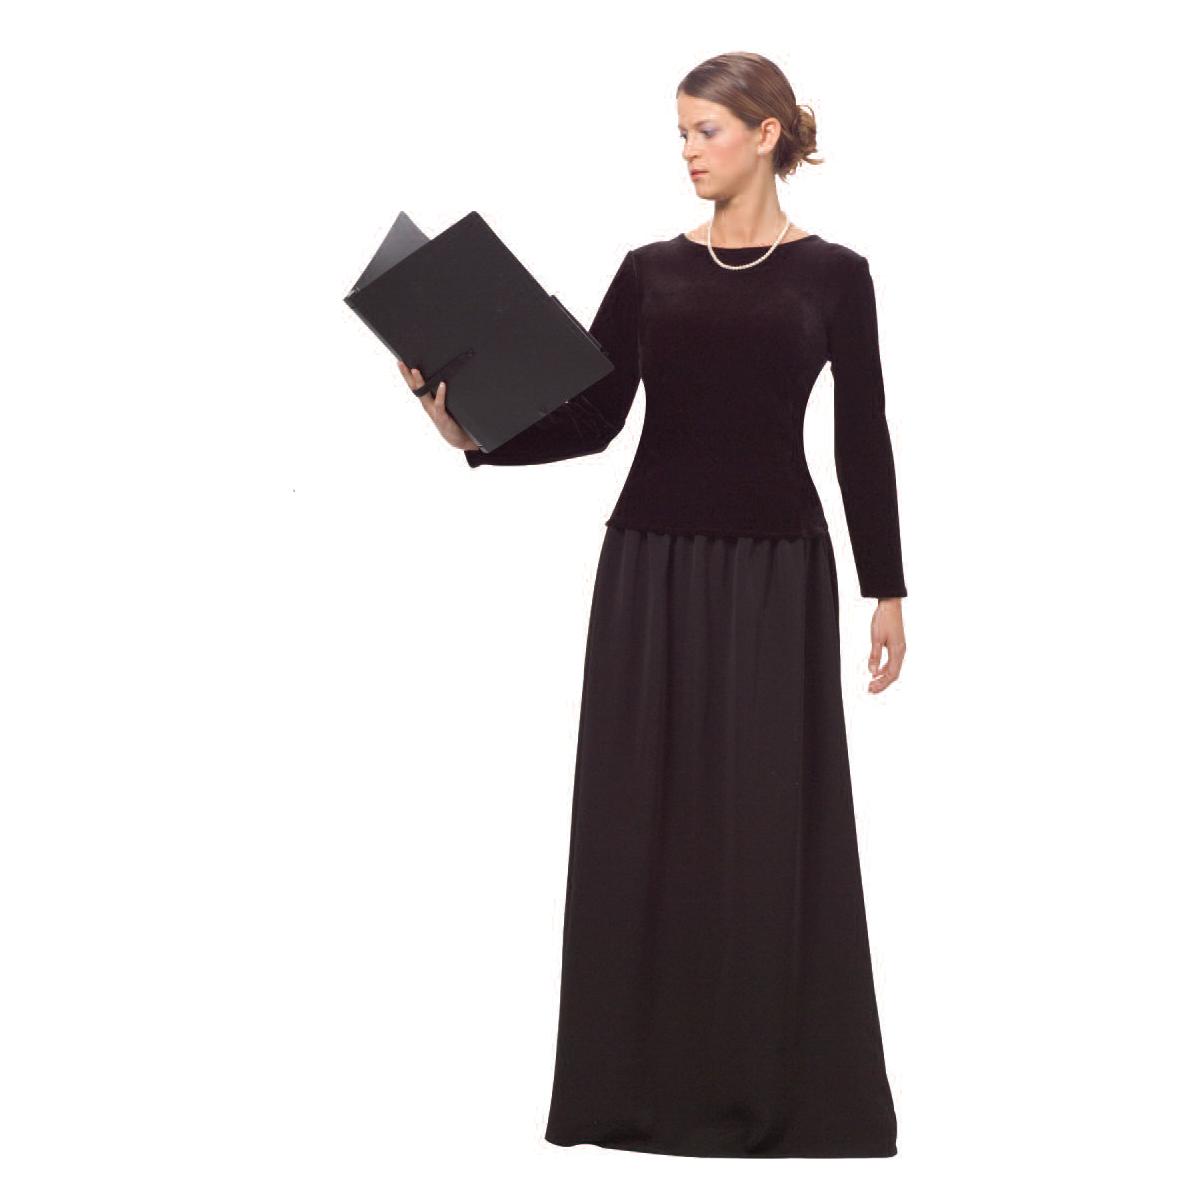 Concert Skirt